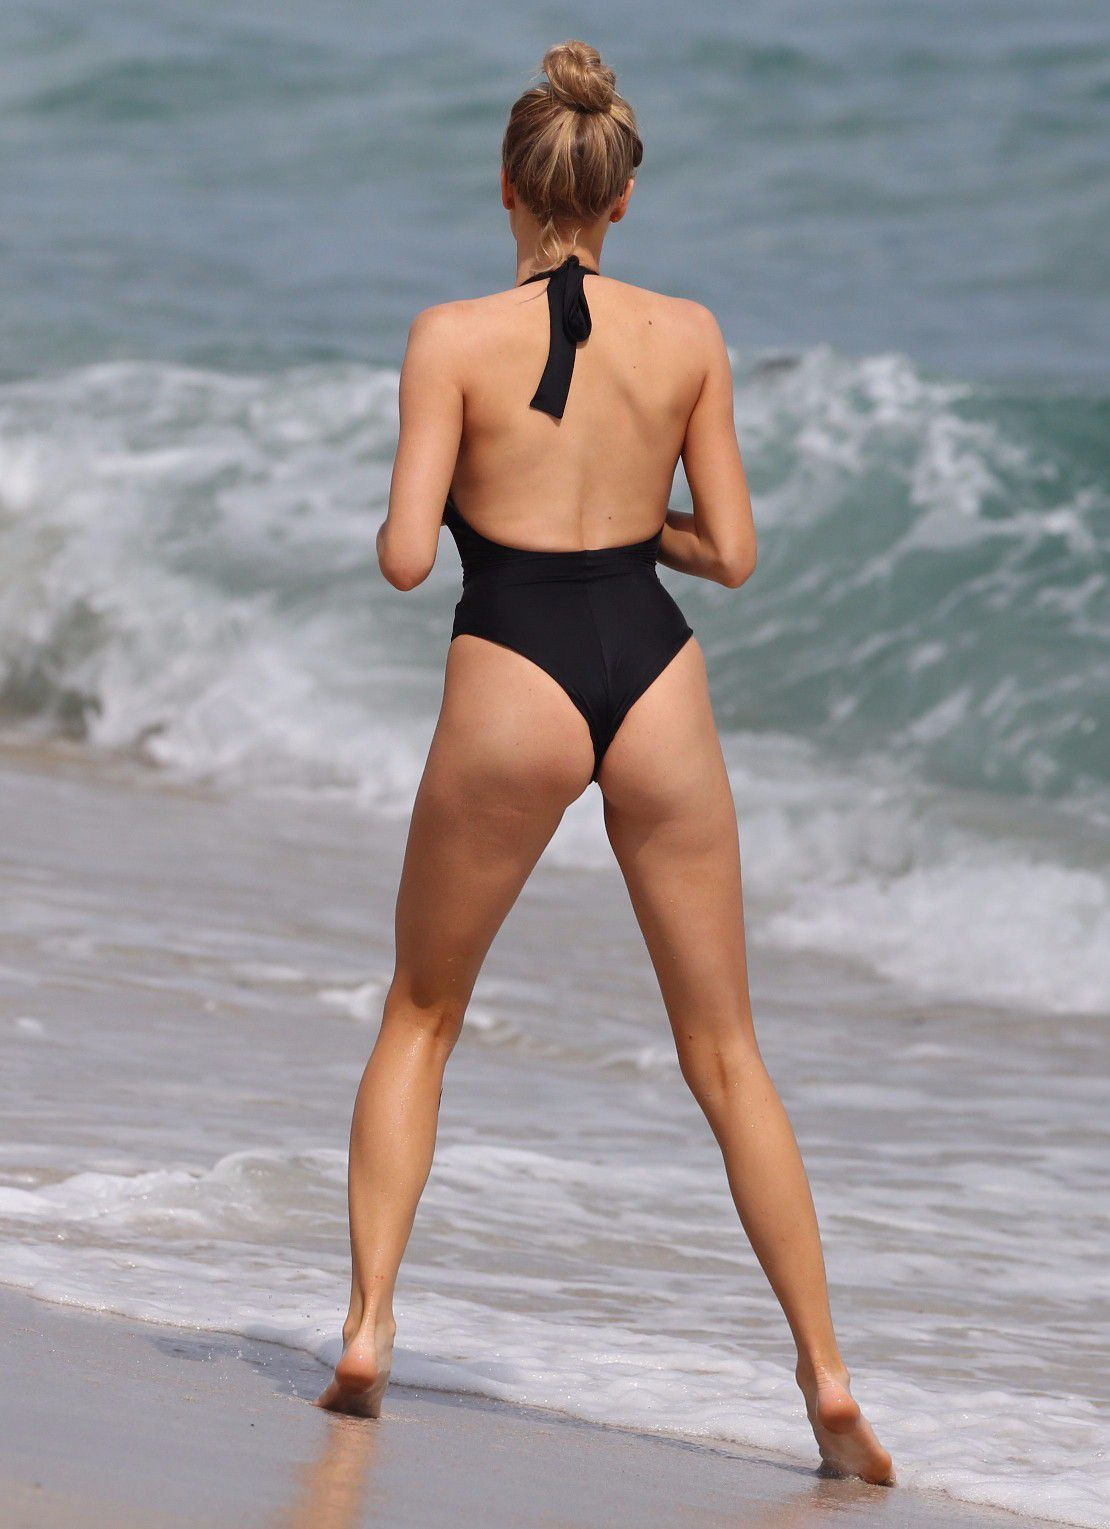 charlotte-mckinney-nipple-slip-at-the-beach-in-miami-13